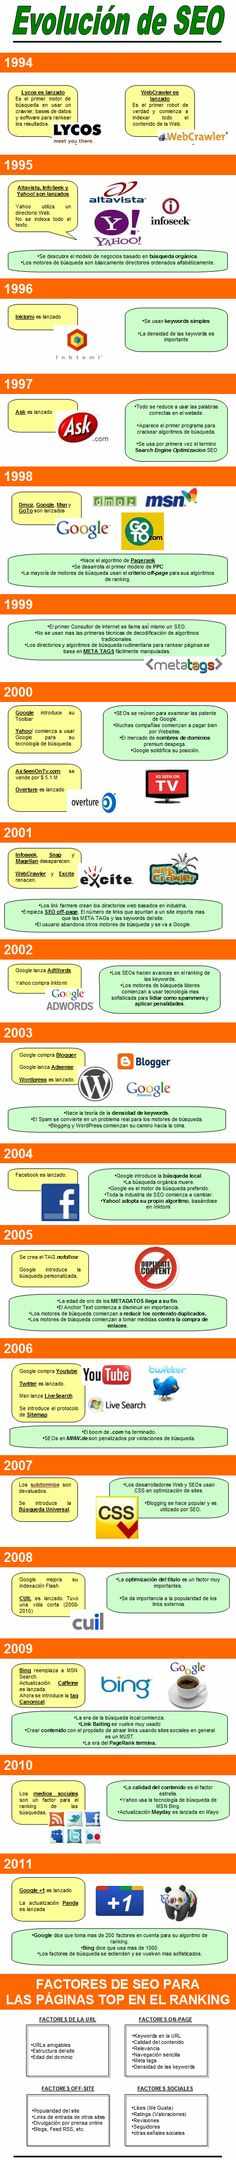 La evolución del SEO #infografia